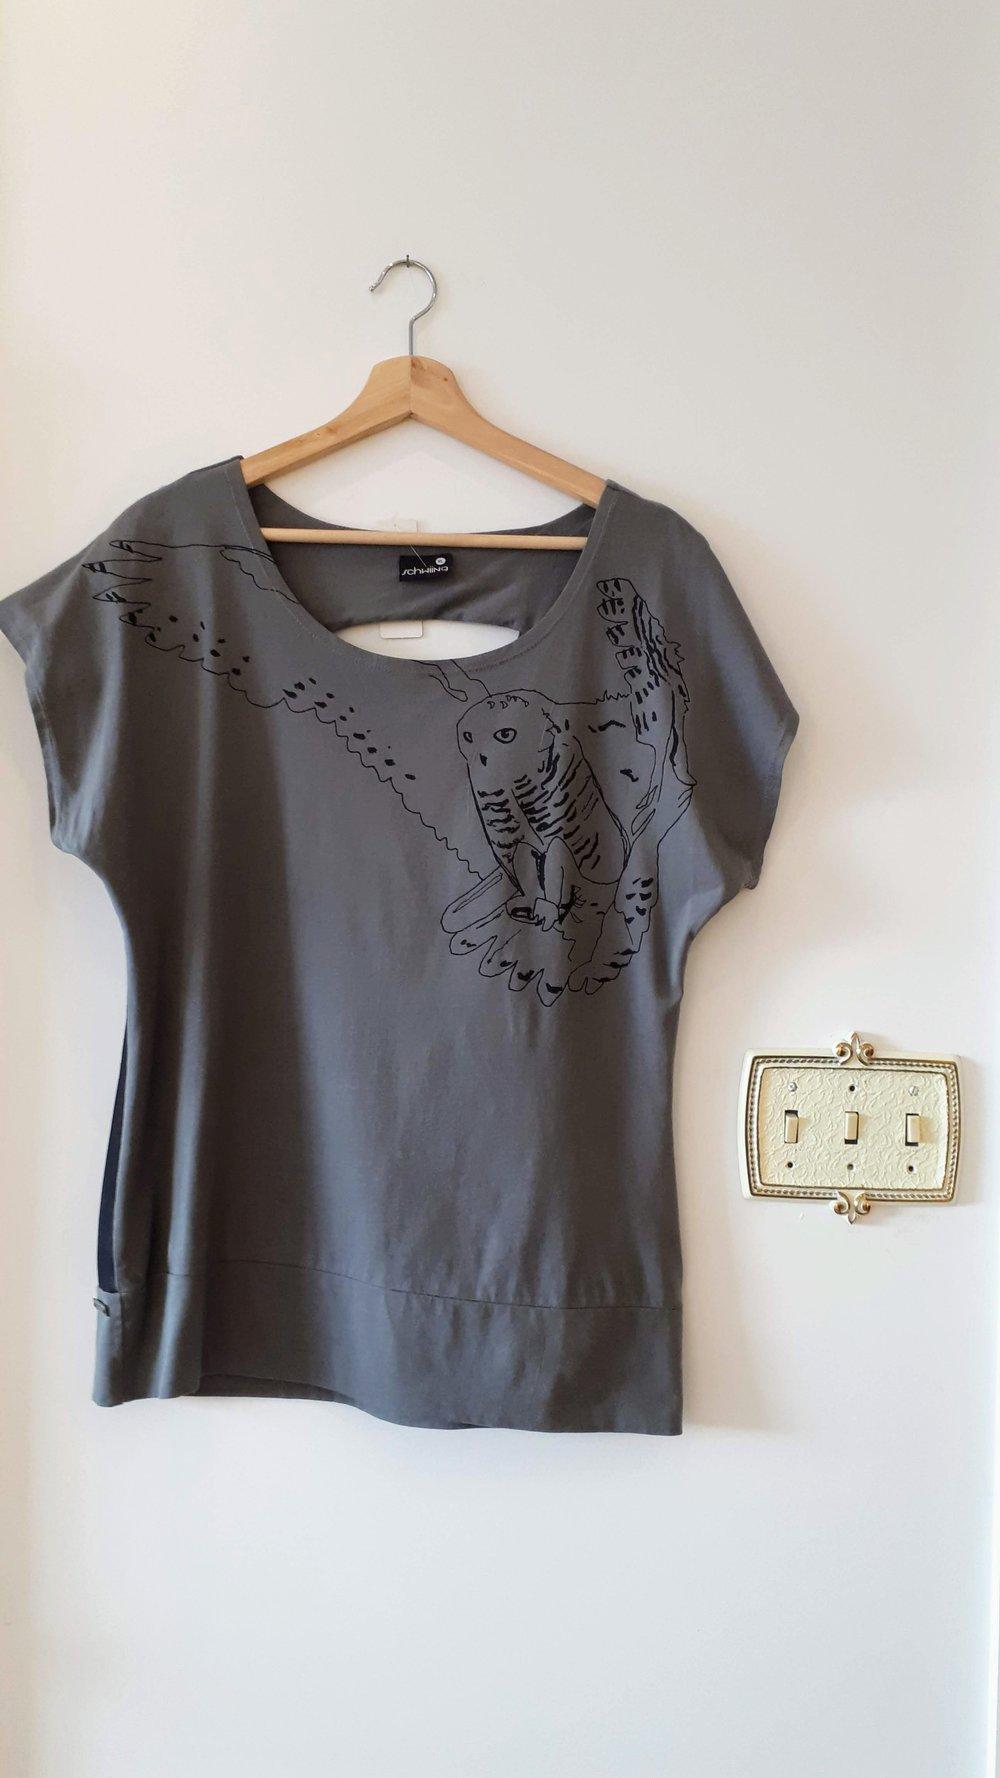 Schwiing top; Size XL, $28